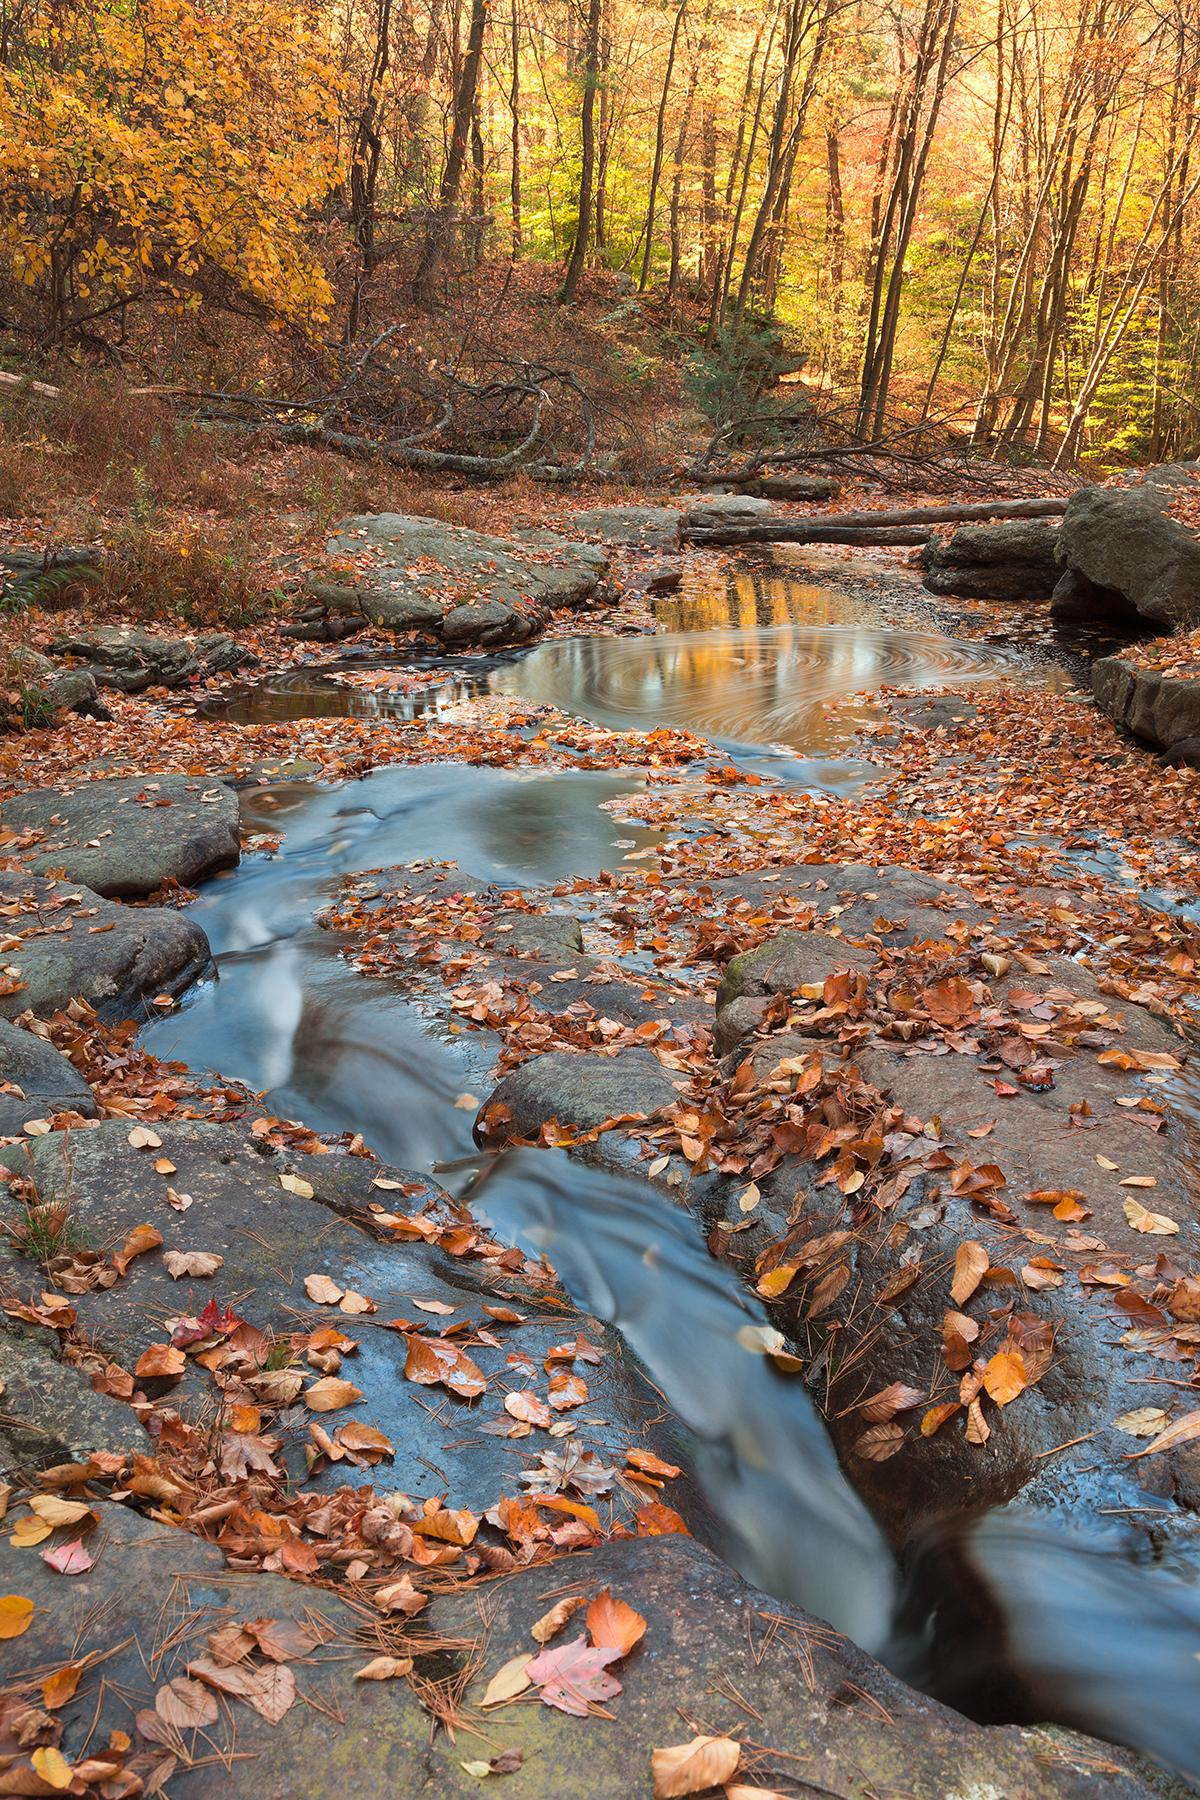 Autumn Boomerang Stream, America, Scenery, State, Spins, HQ Photo